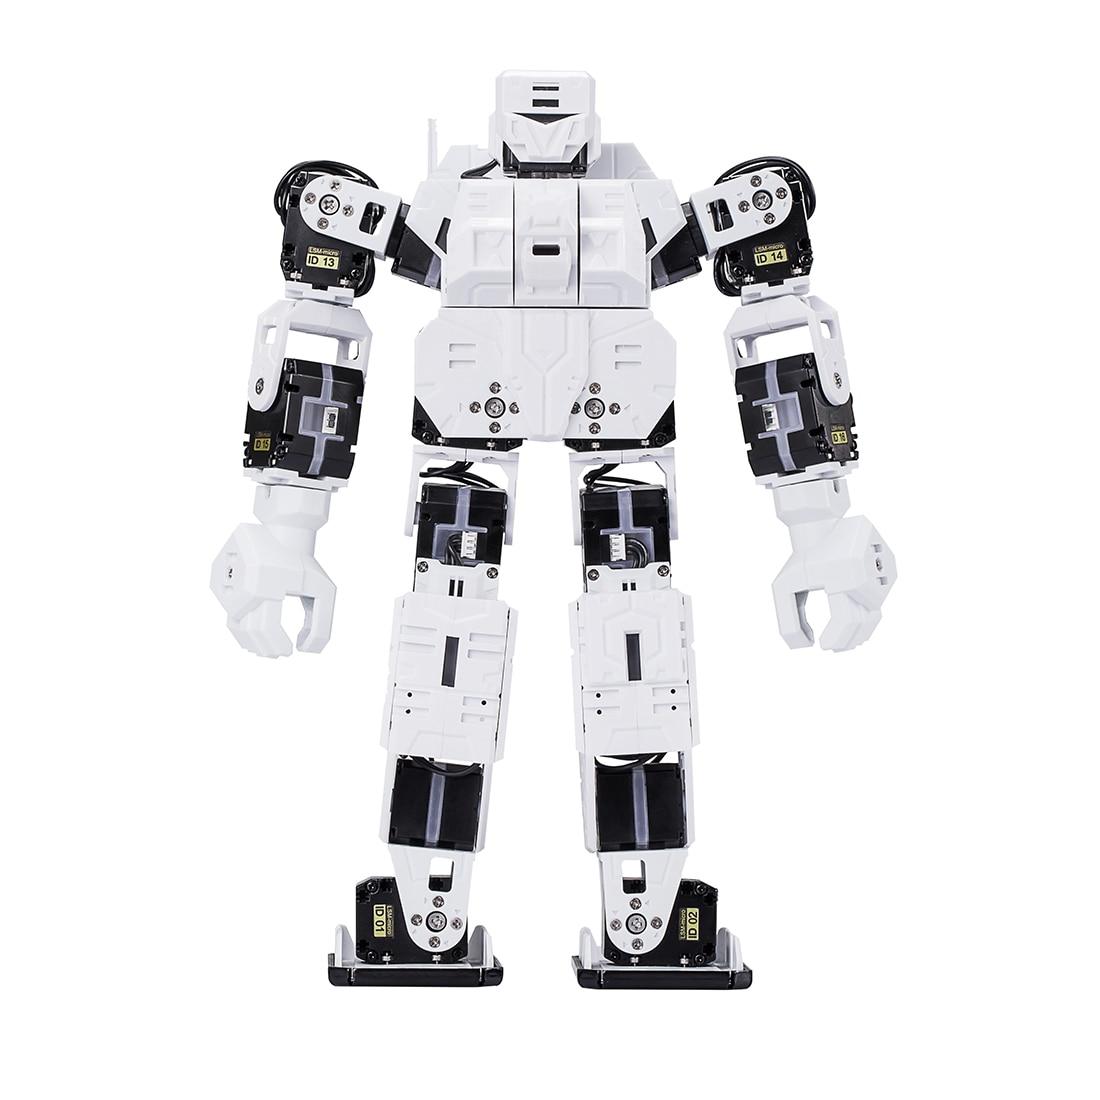 Nuevo Robot DIY de 27cm, línea de tiempo creativa, núcleo M, Kit gráfico programable de Robot humanoide, Robot Educativo, Blanco/rojo/azul